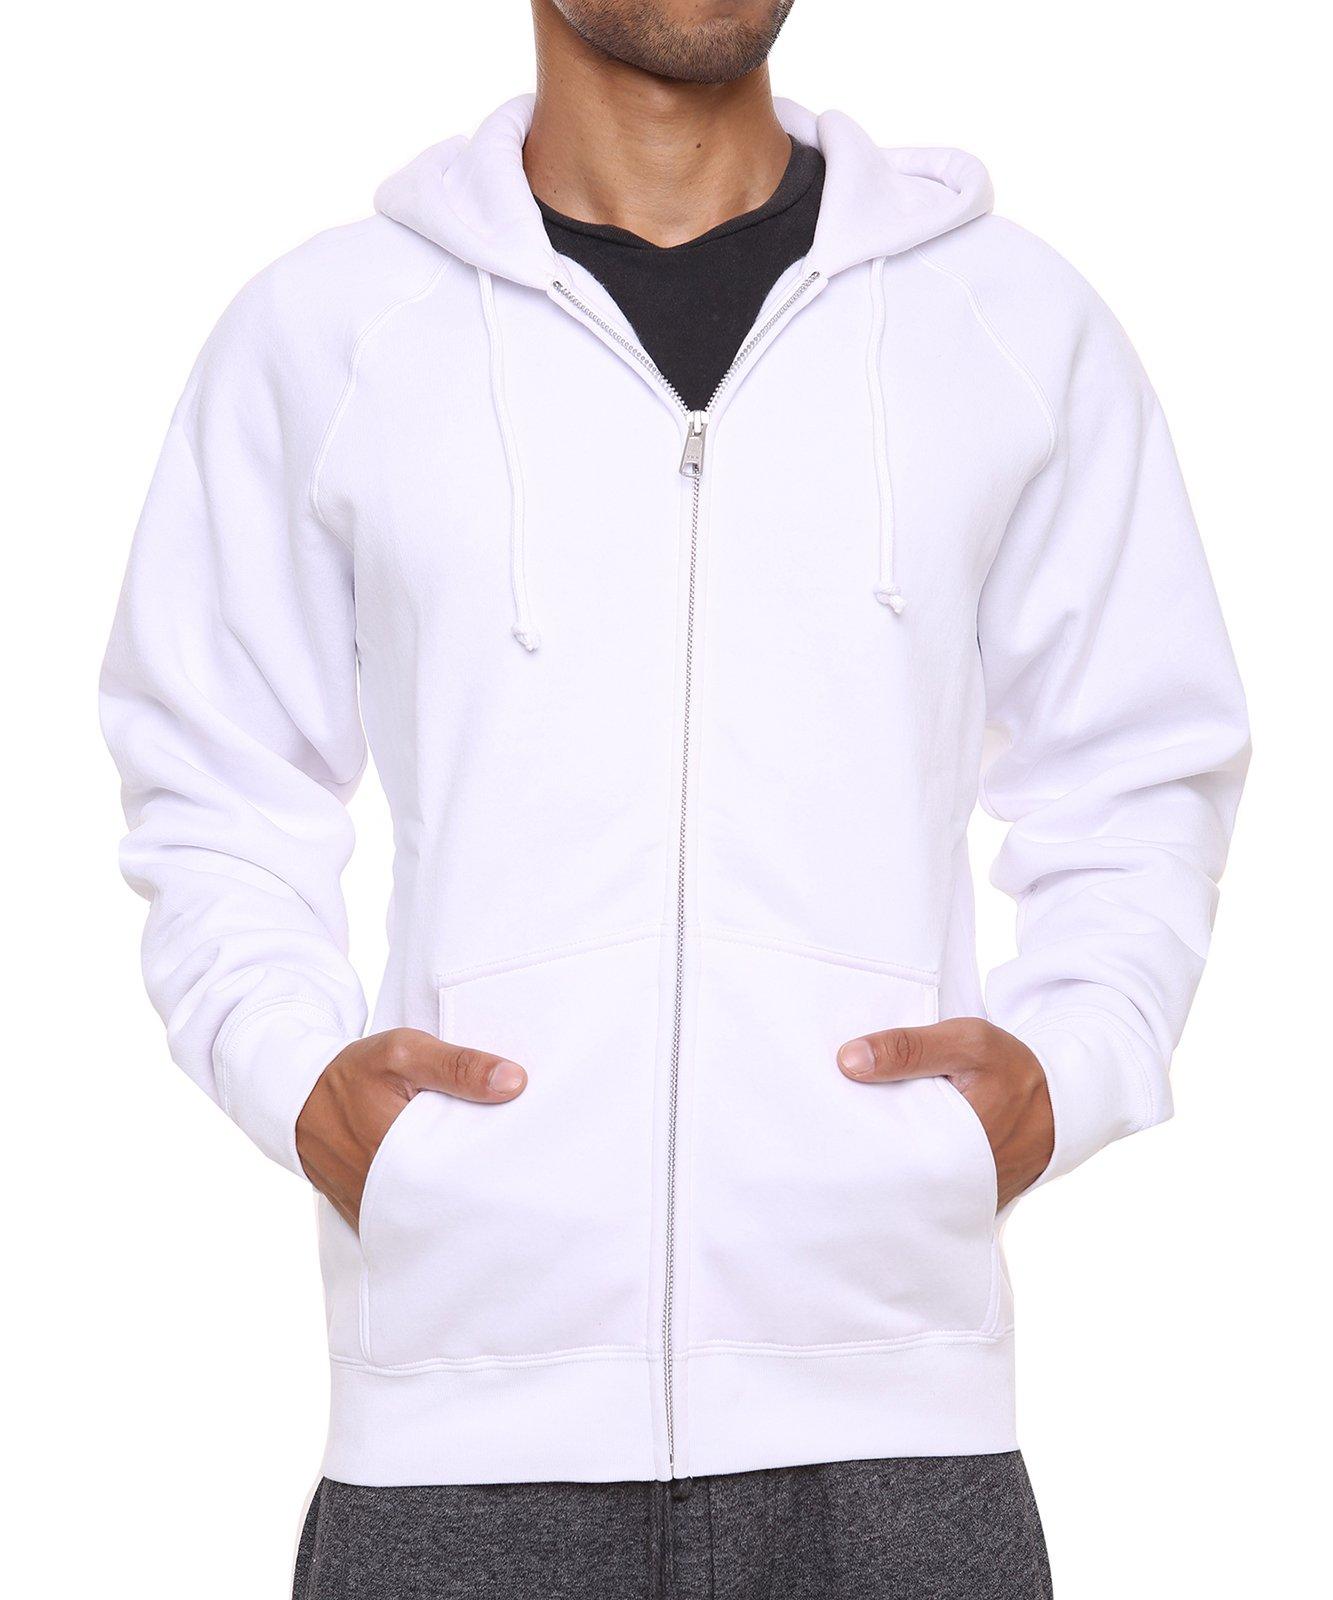 FORBIDEFENSE Men's Sweatshirt Hoodies Full Sleeve-Front Zip Premium Hood 2 Kangaroo Split Pocket